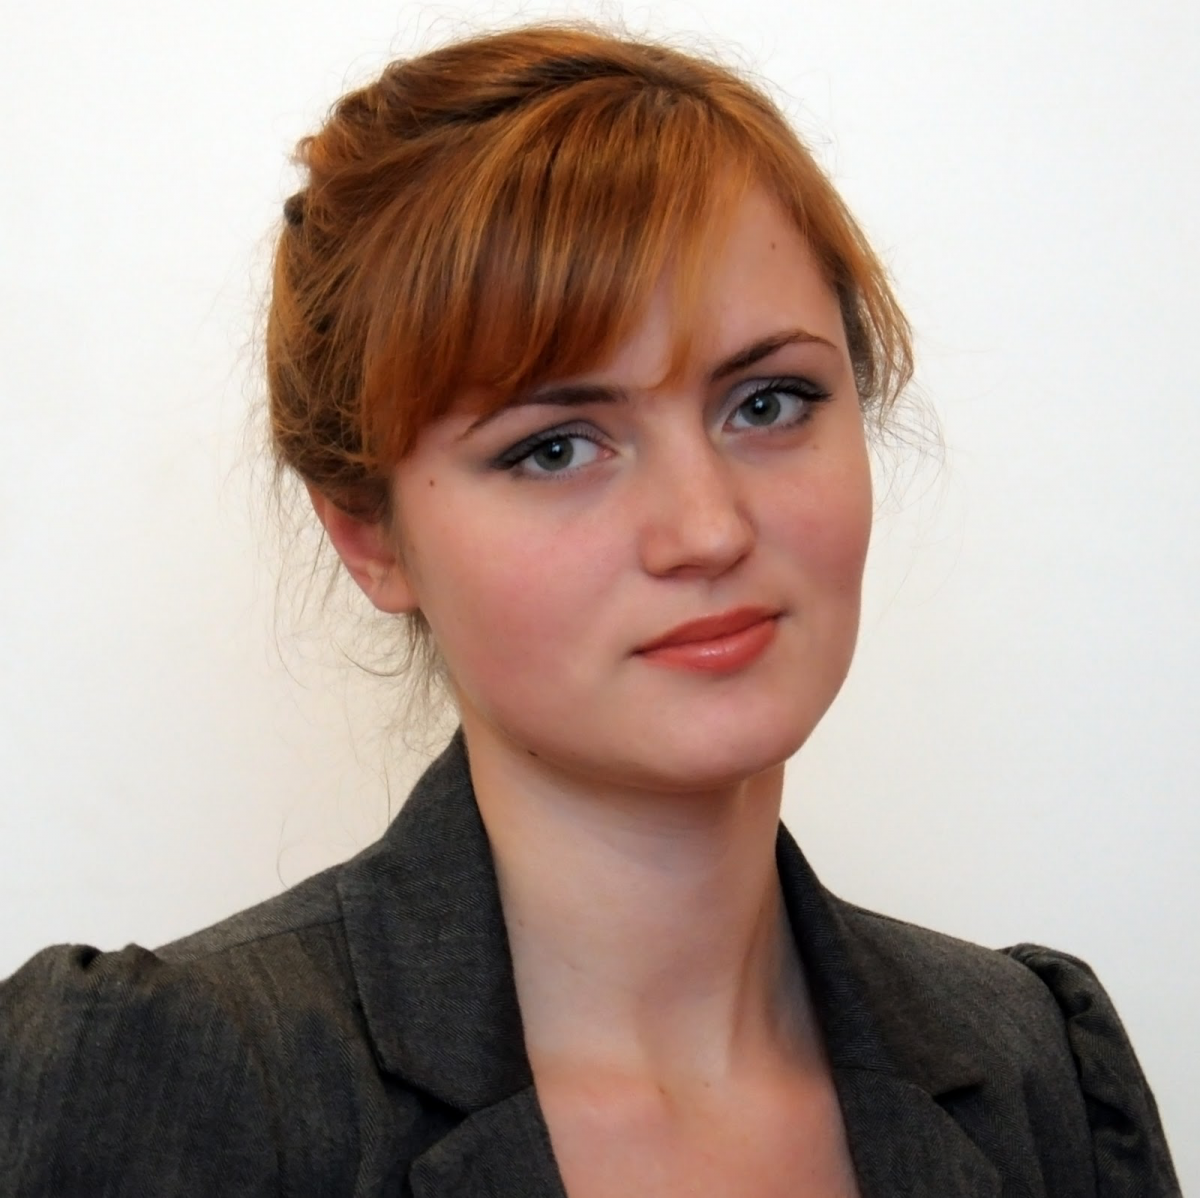 Headshot of Nataliia Kharchenko